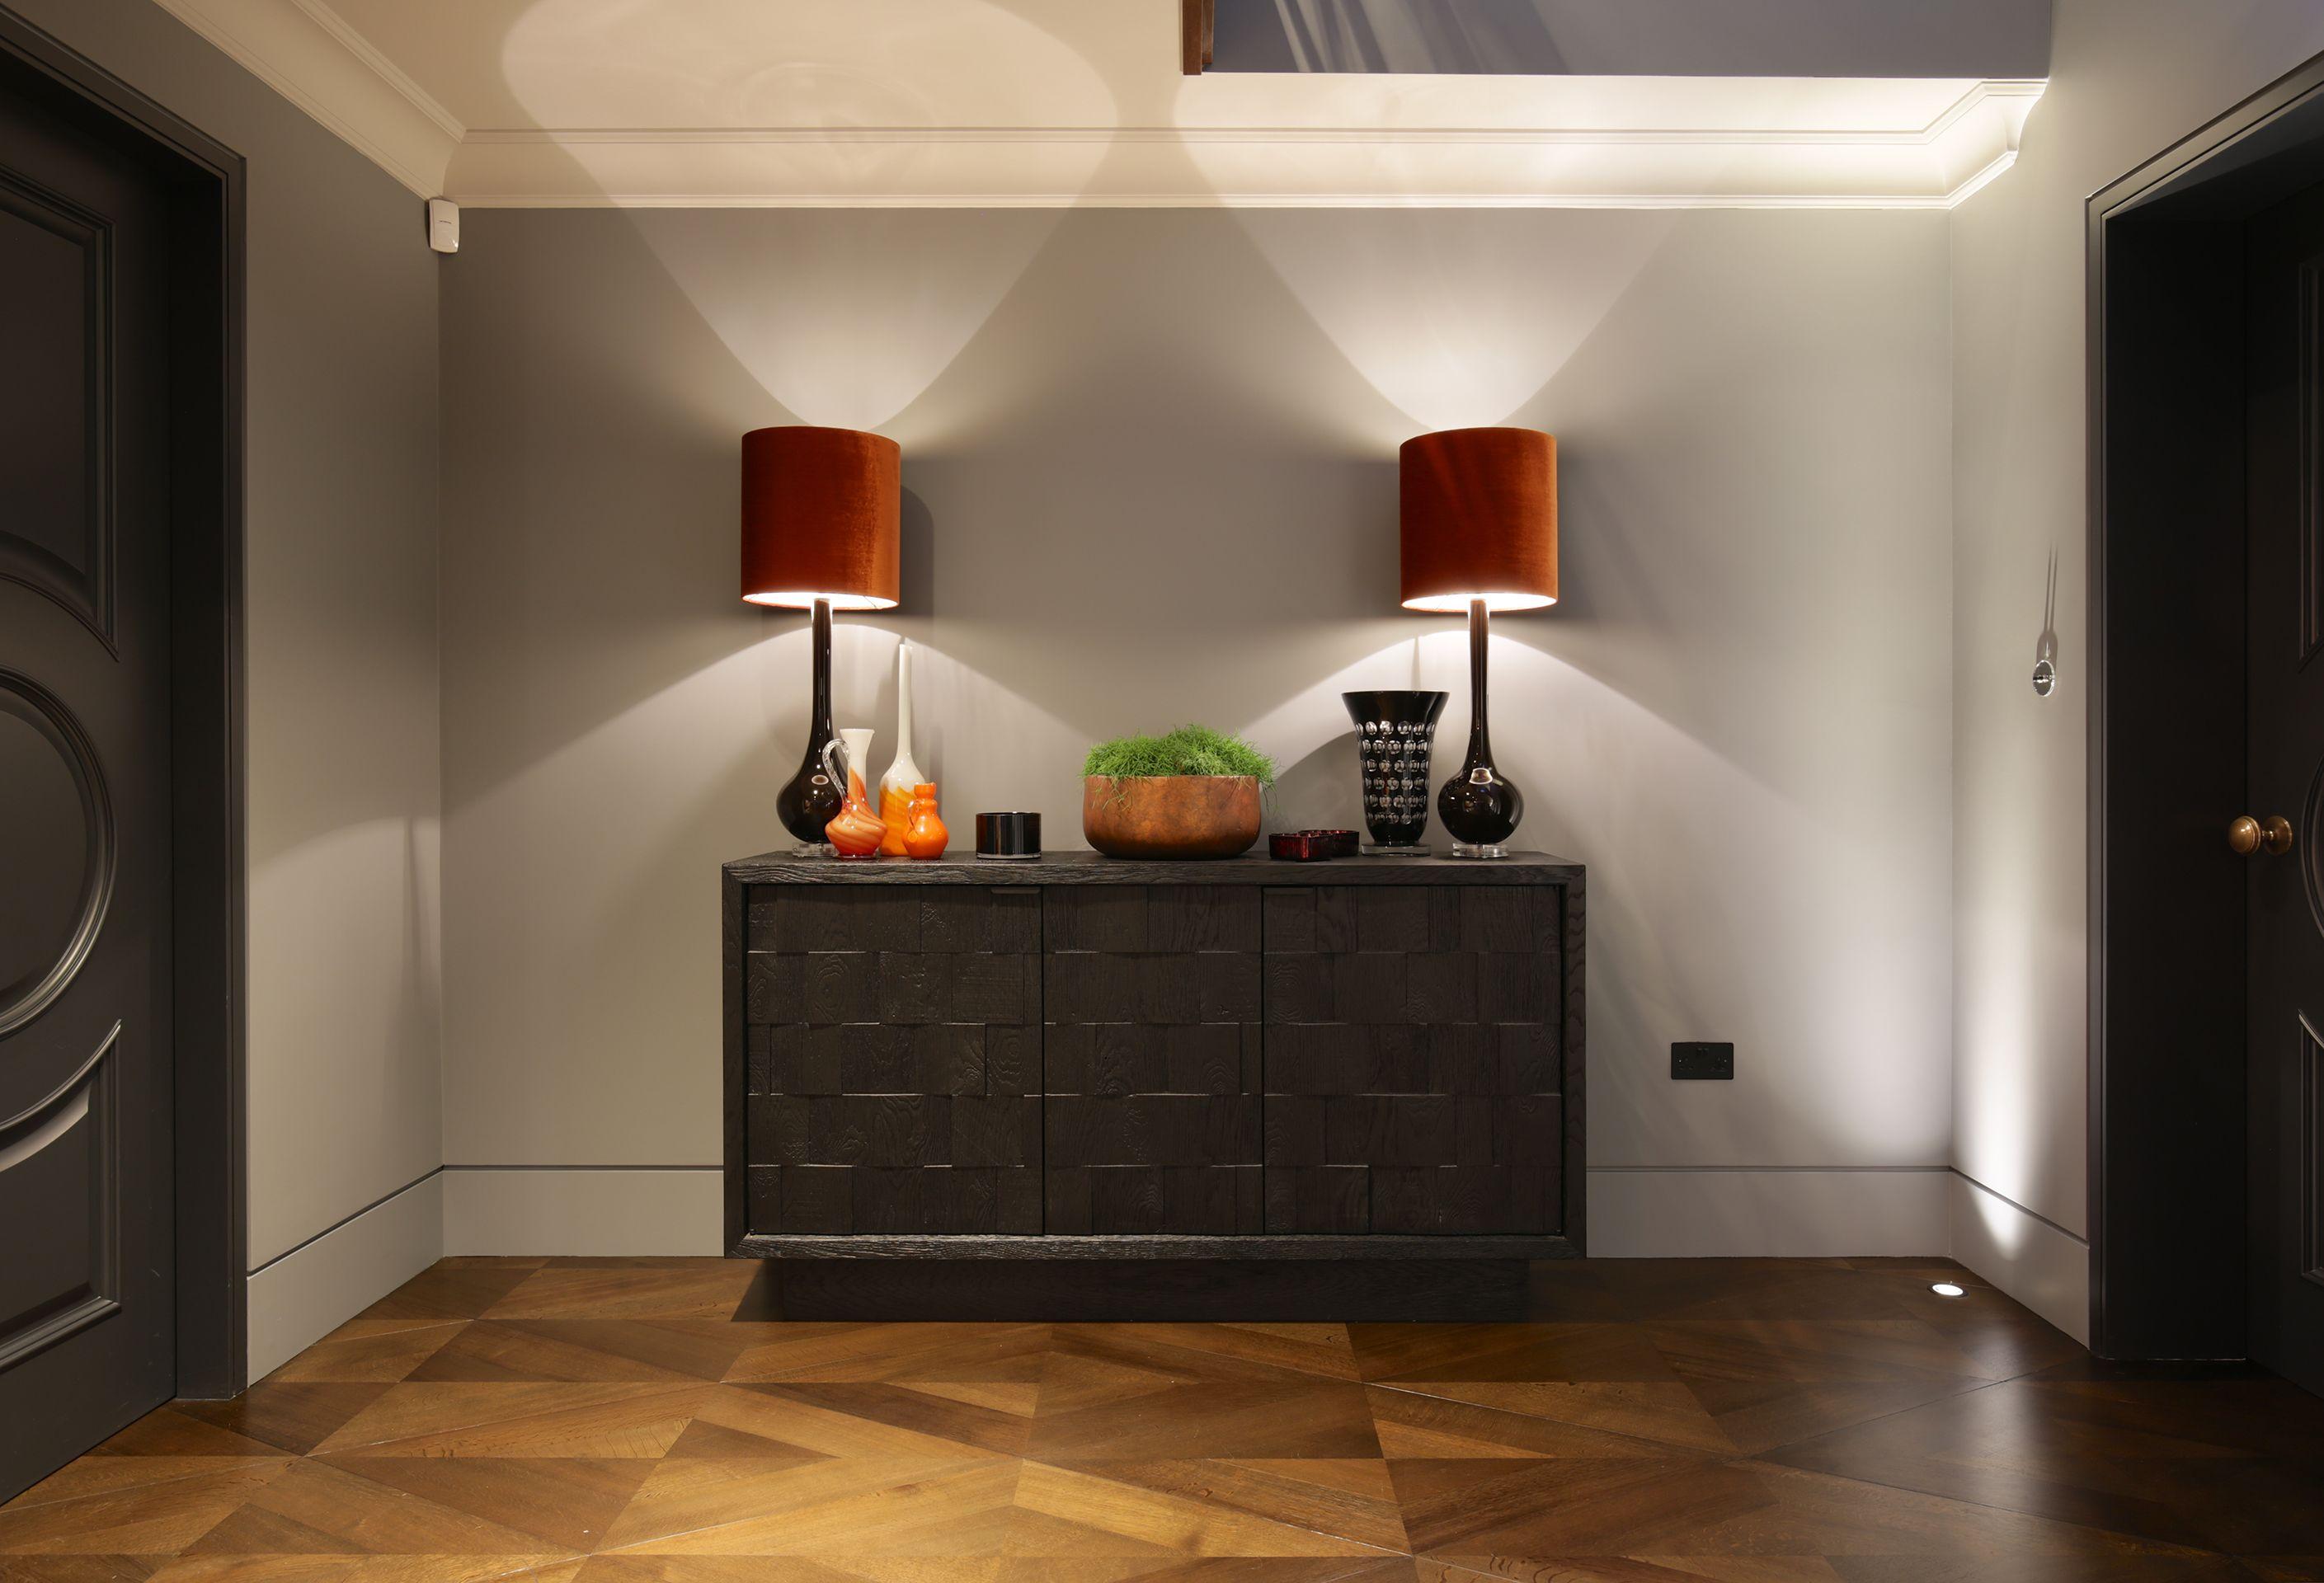 Gourd Lamps By Porta Romana Beverley Barnett Interiors